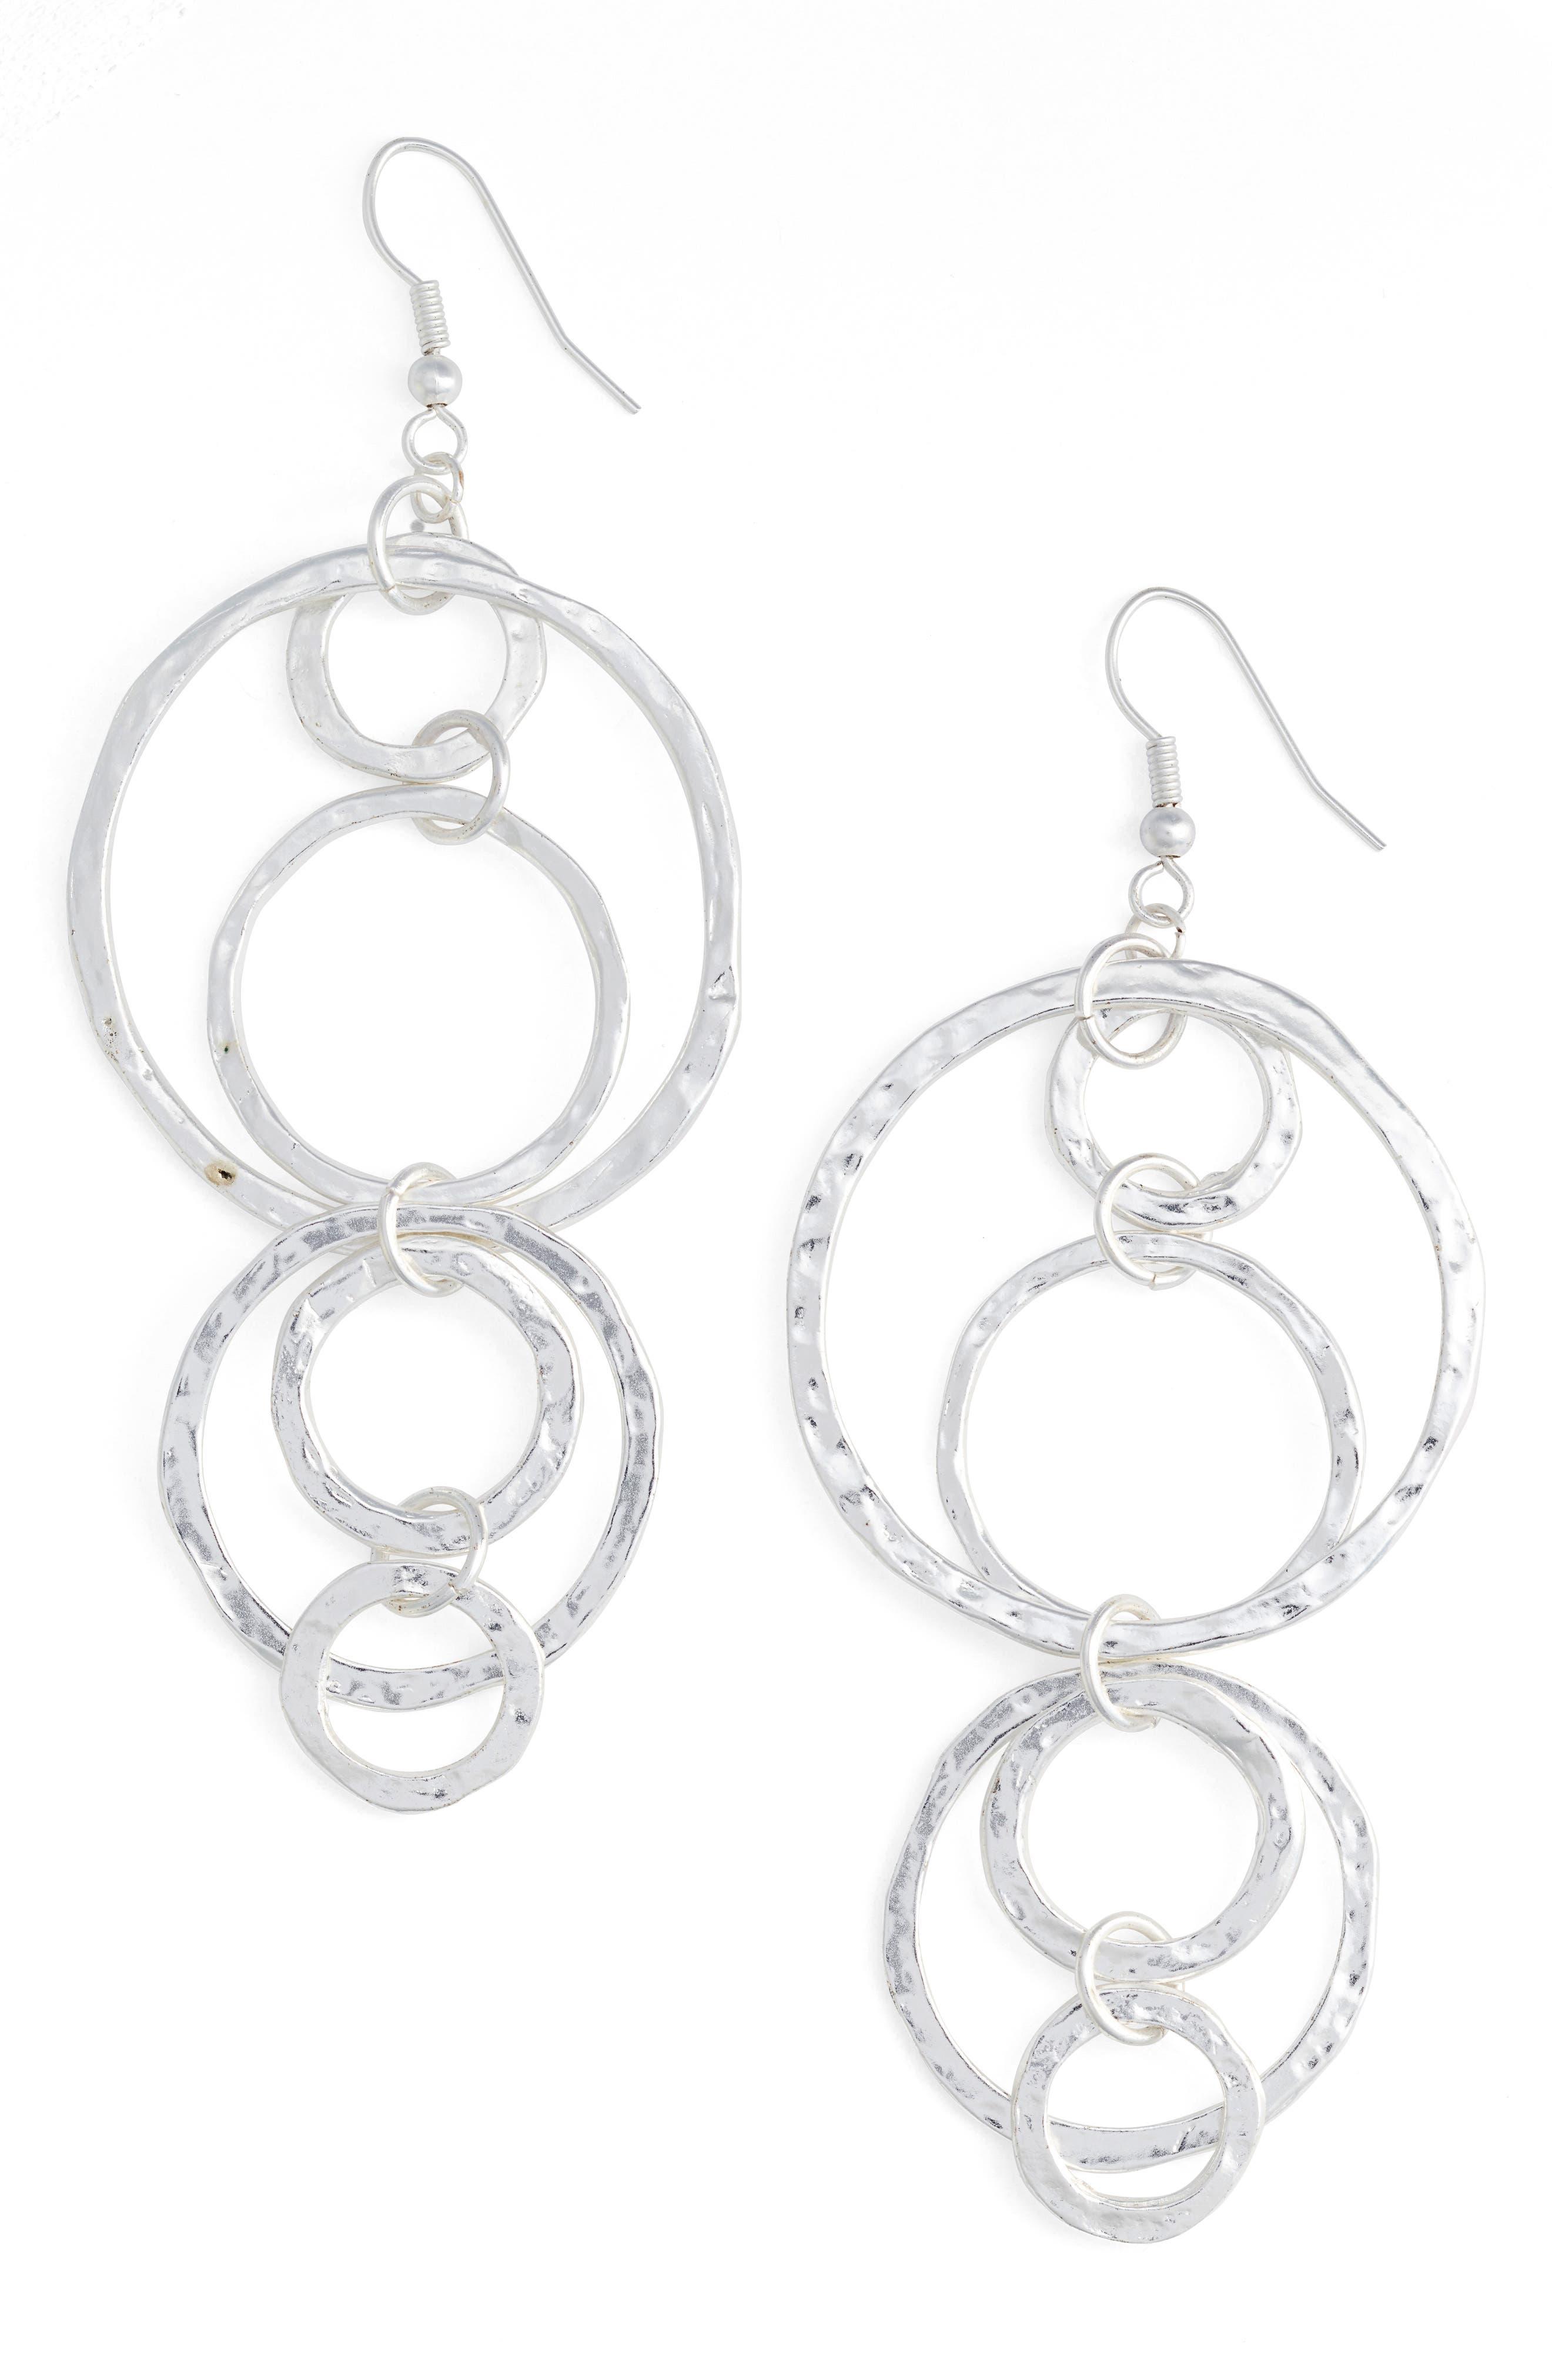 Louane Multi Circle Drop Earrings,                             Main thumbnail 1, color,                             SILVER